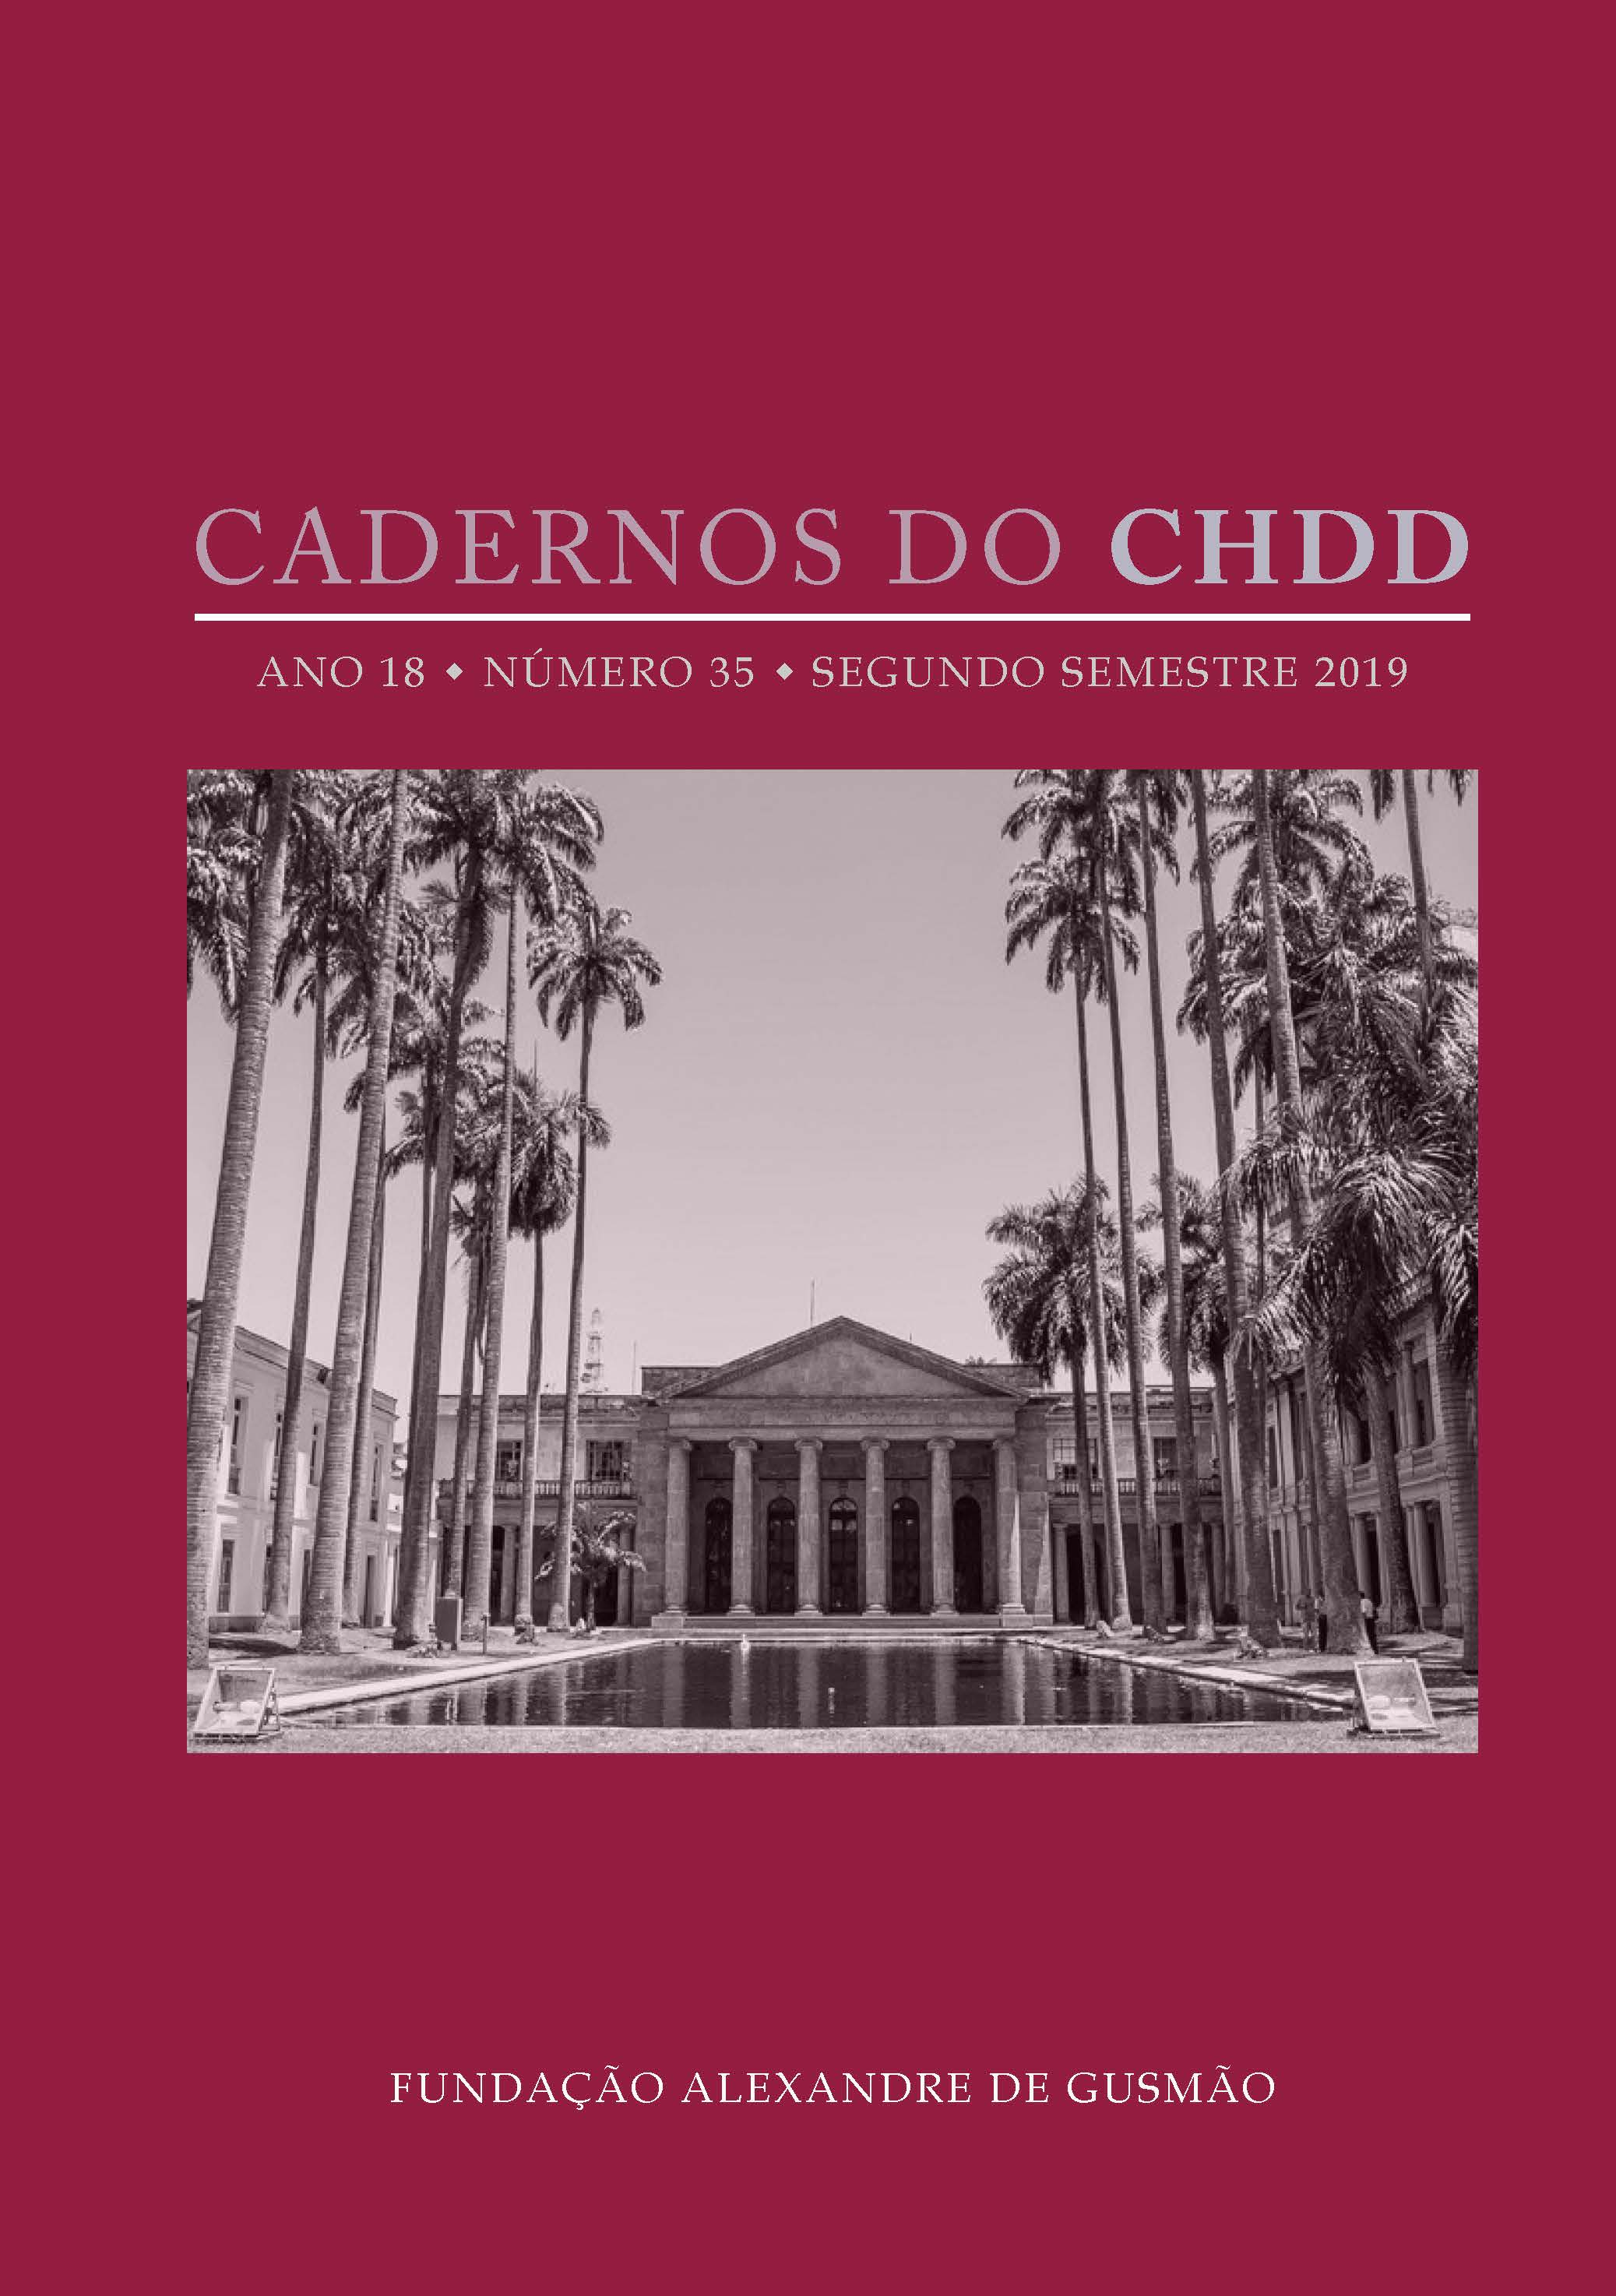 Cadernos do CHDD – ano 18 . nº 35 . segundo semestre de 2019